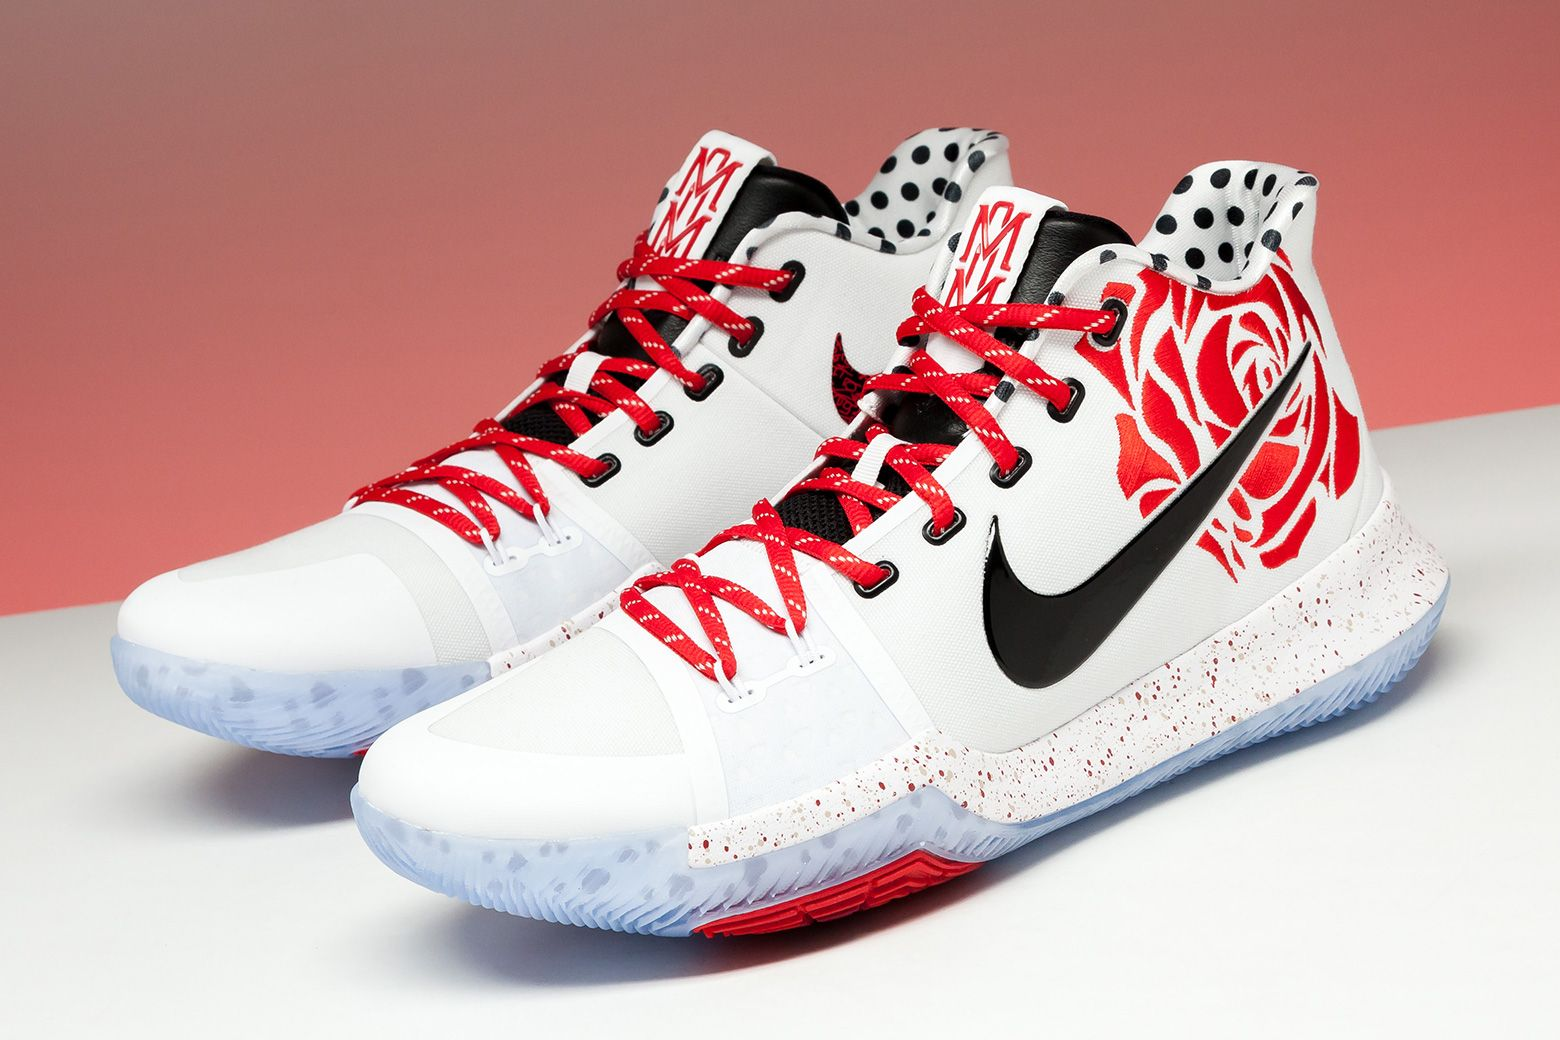 36f9903658b3 Nike Kyrie 3